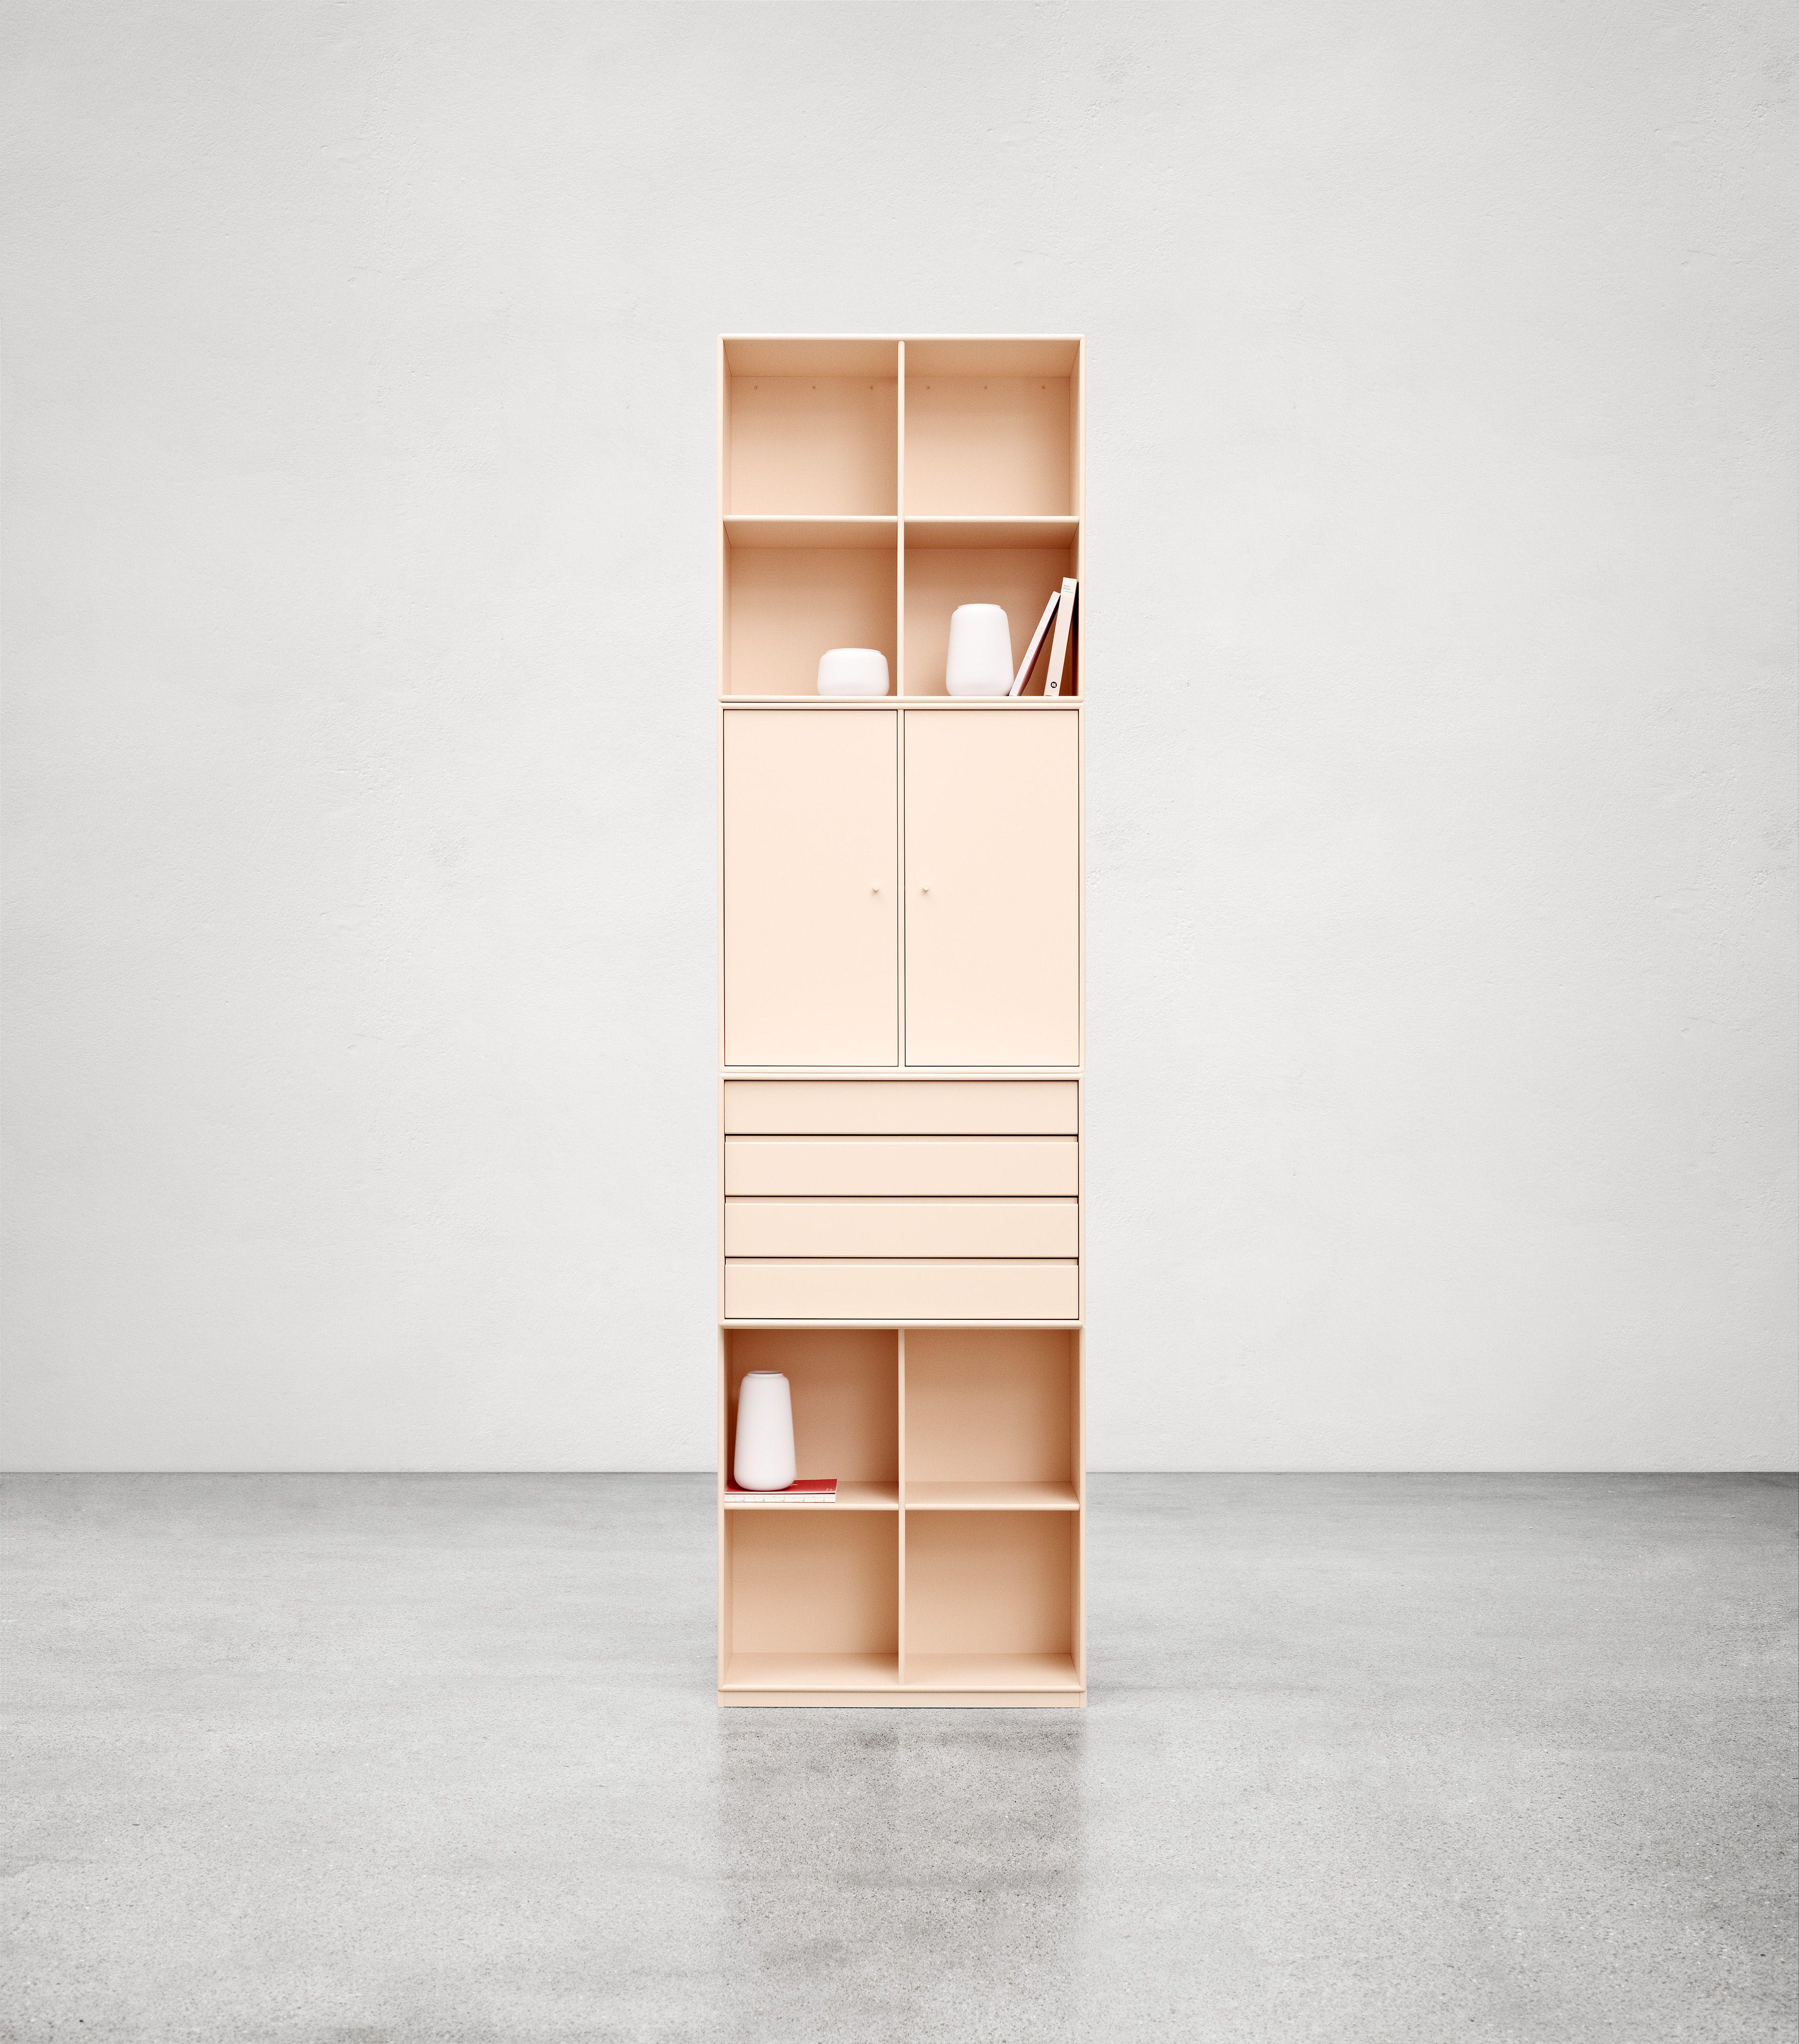 #montana #furniture #storage #peach #